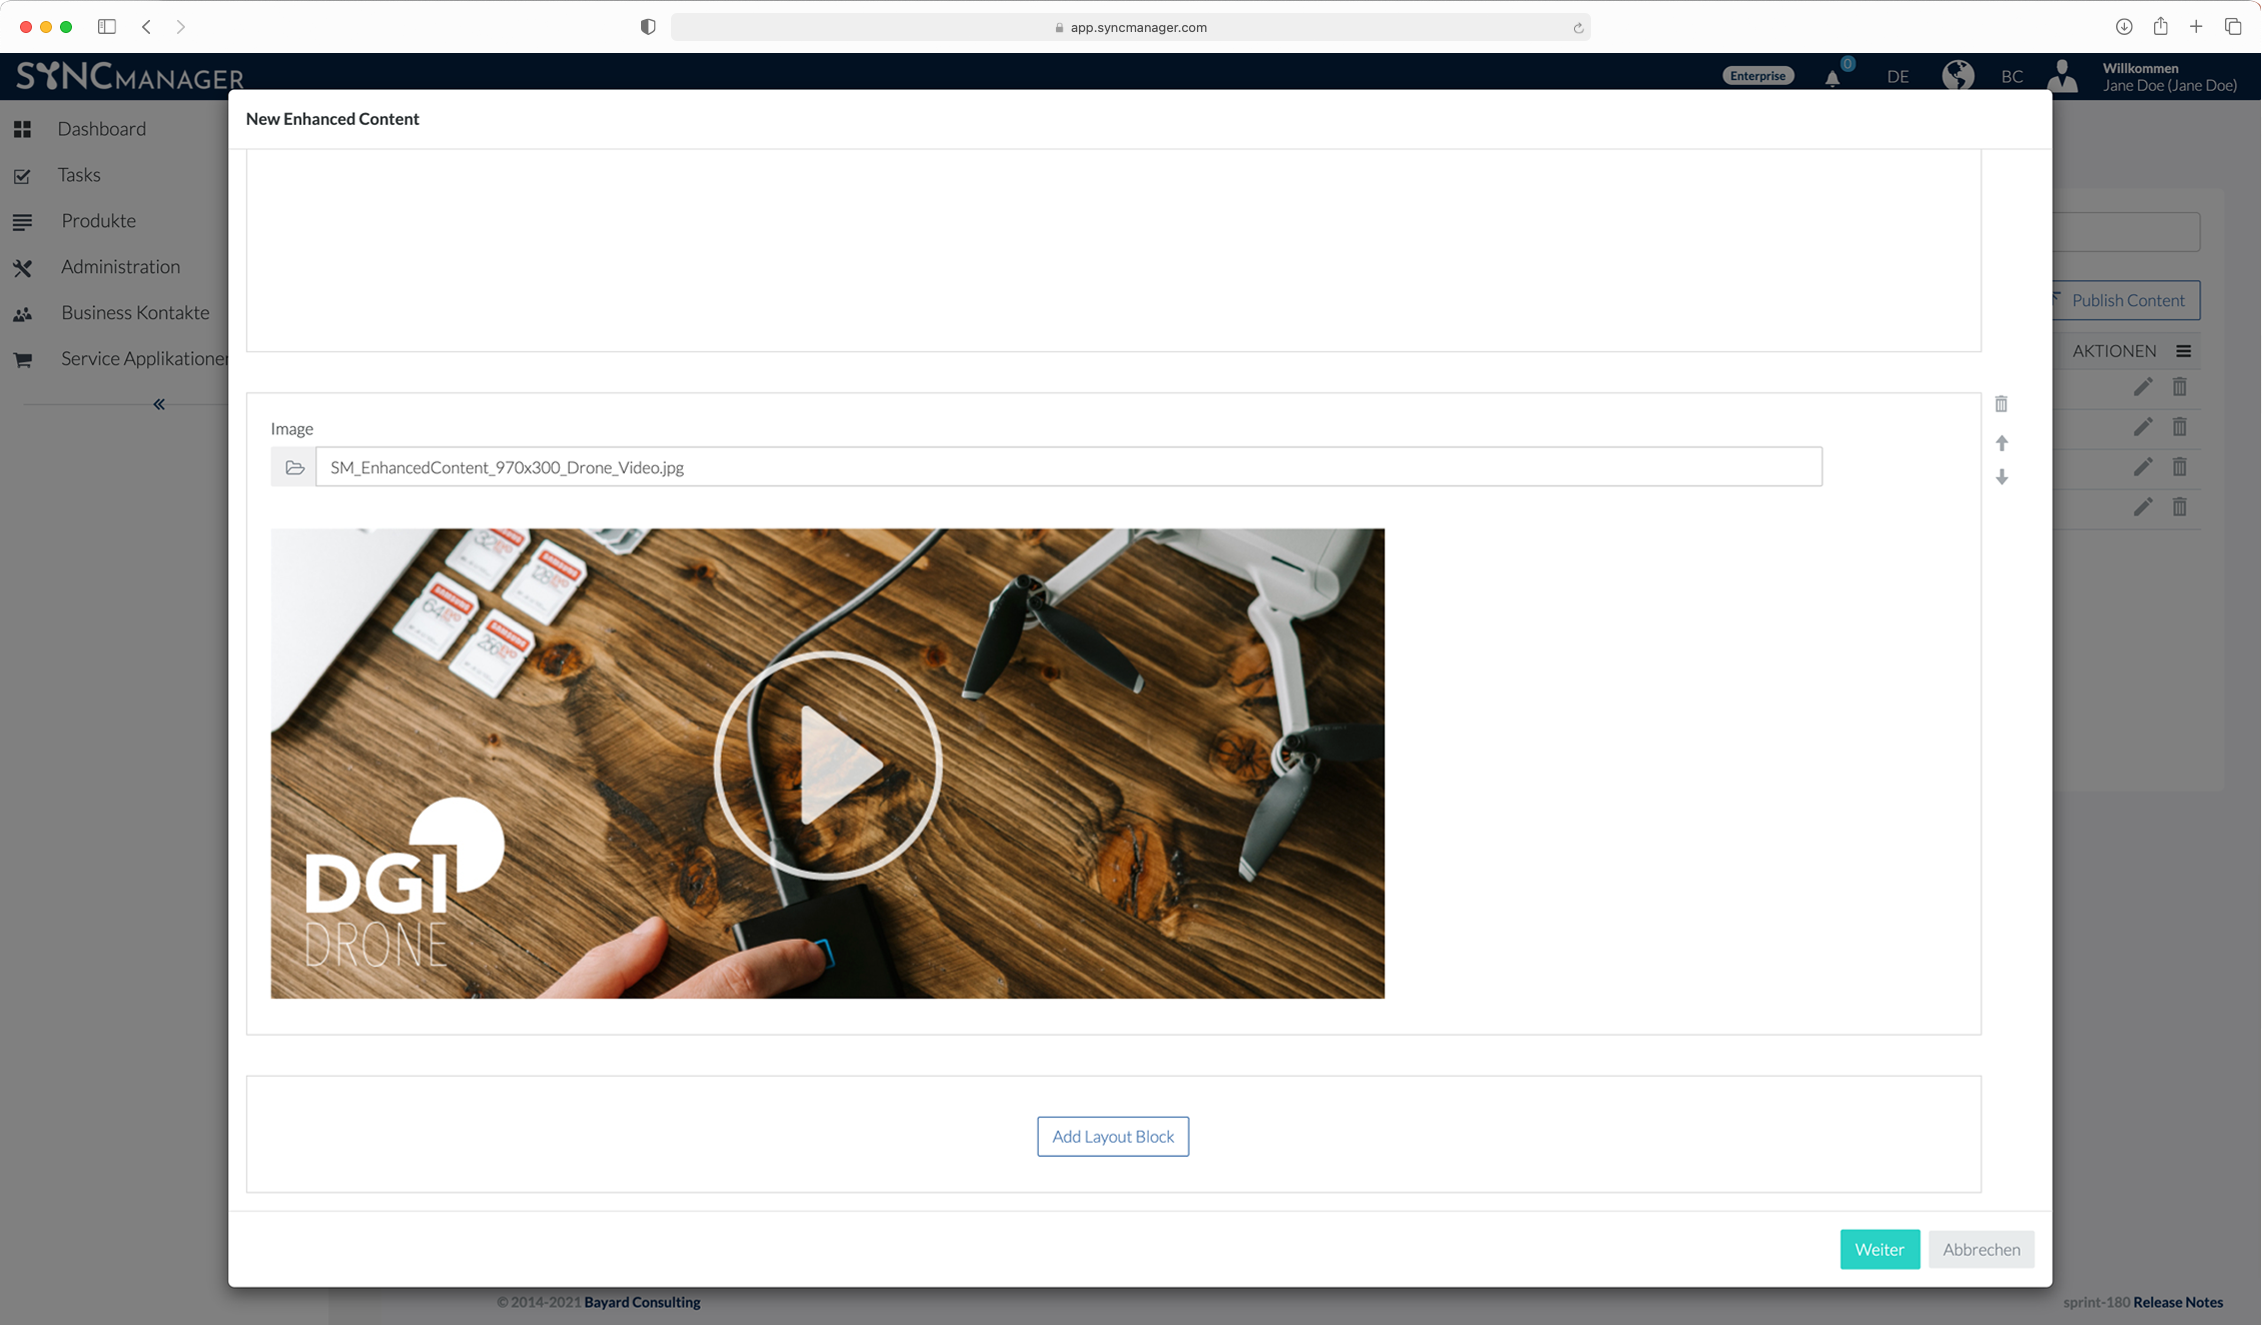 SyncManager – Produkt-Webshop-Detailseiten für Lieferanten – Enhanced Content – FMCG